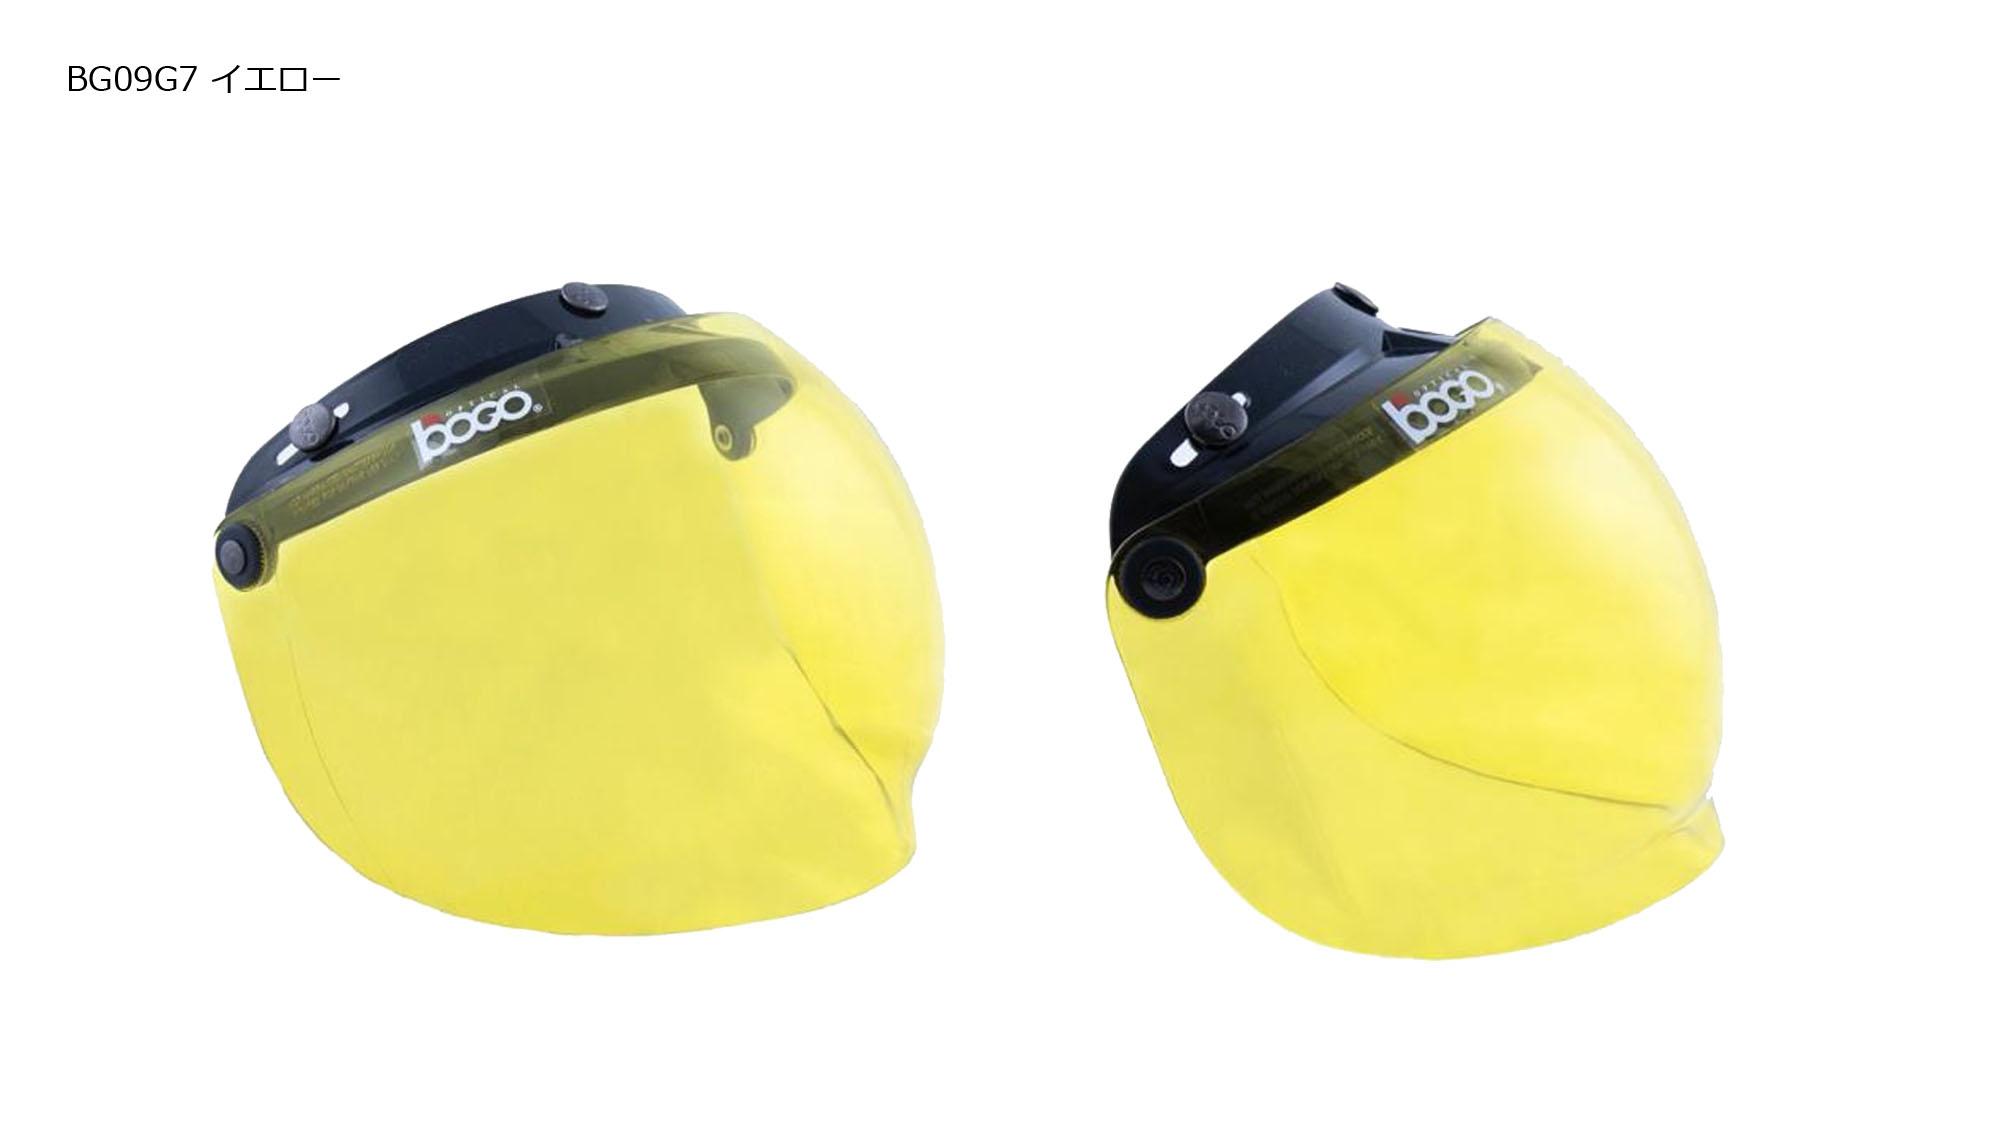 bogo ヘルメット用バイザー バブルシールド イエロー bg09g7